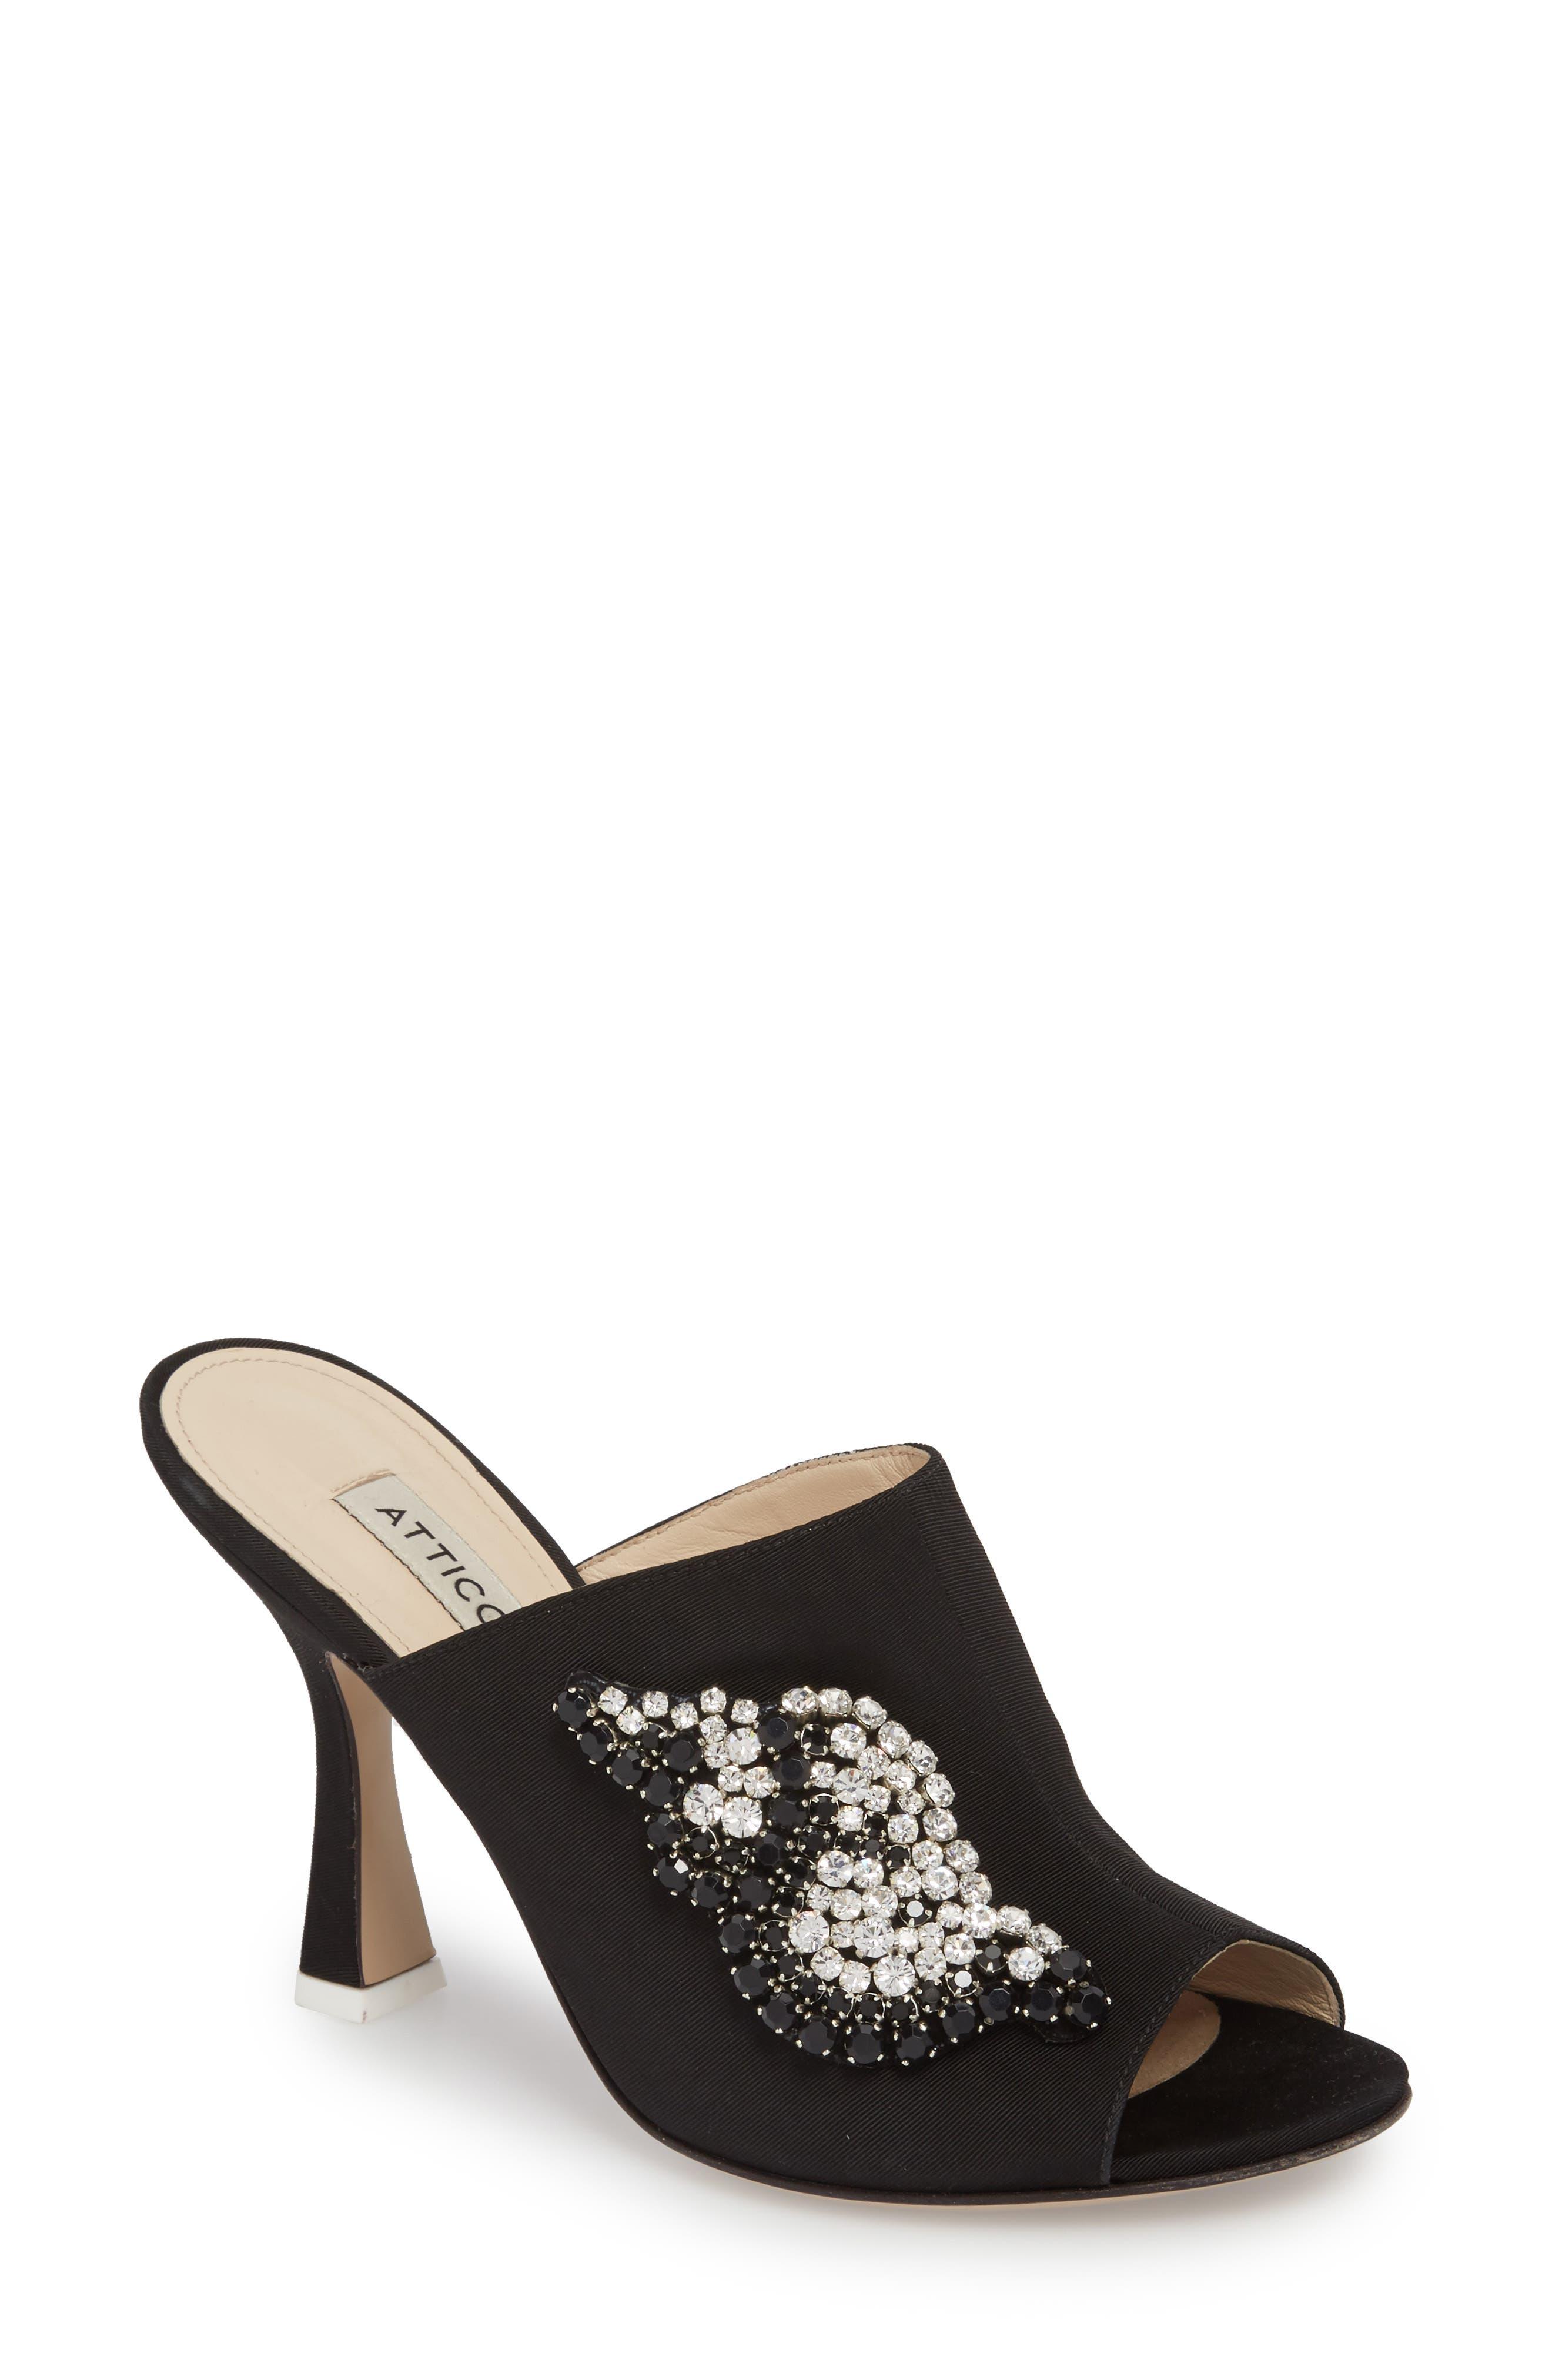 Pamela Open Toe Mule,                         Main,                         color, Black/ Silver